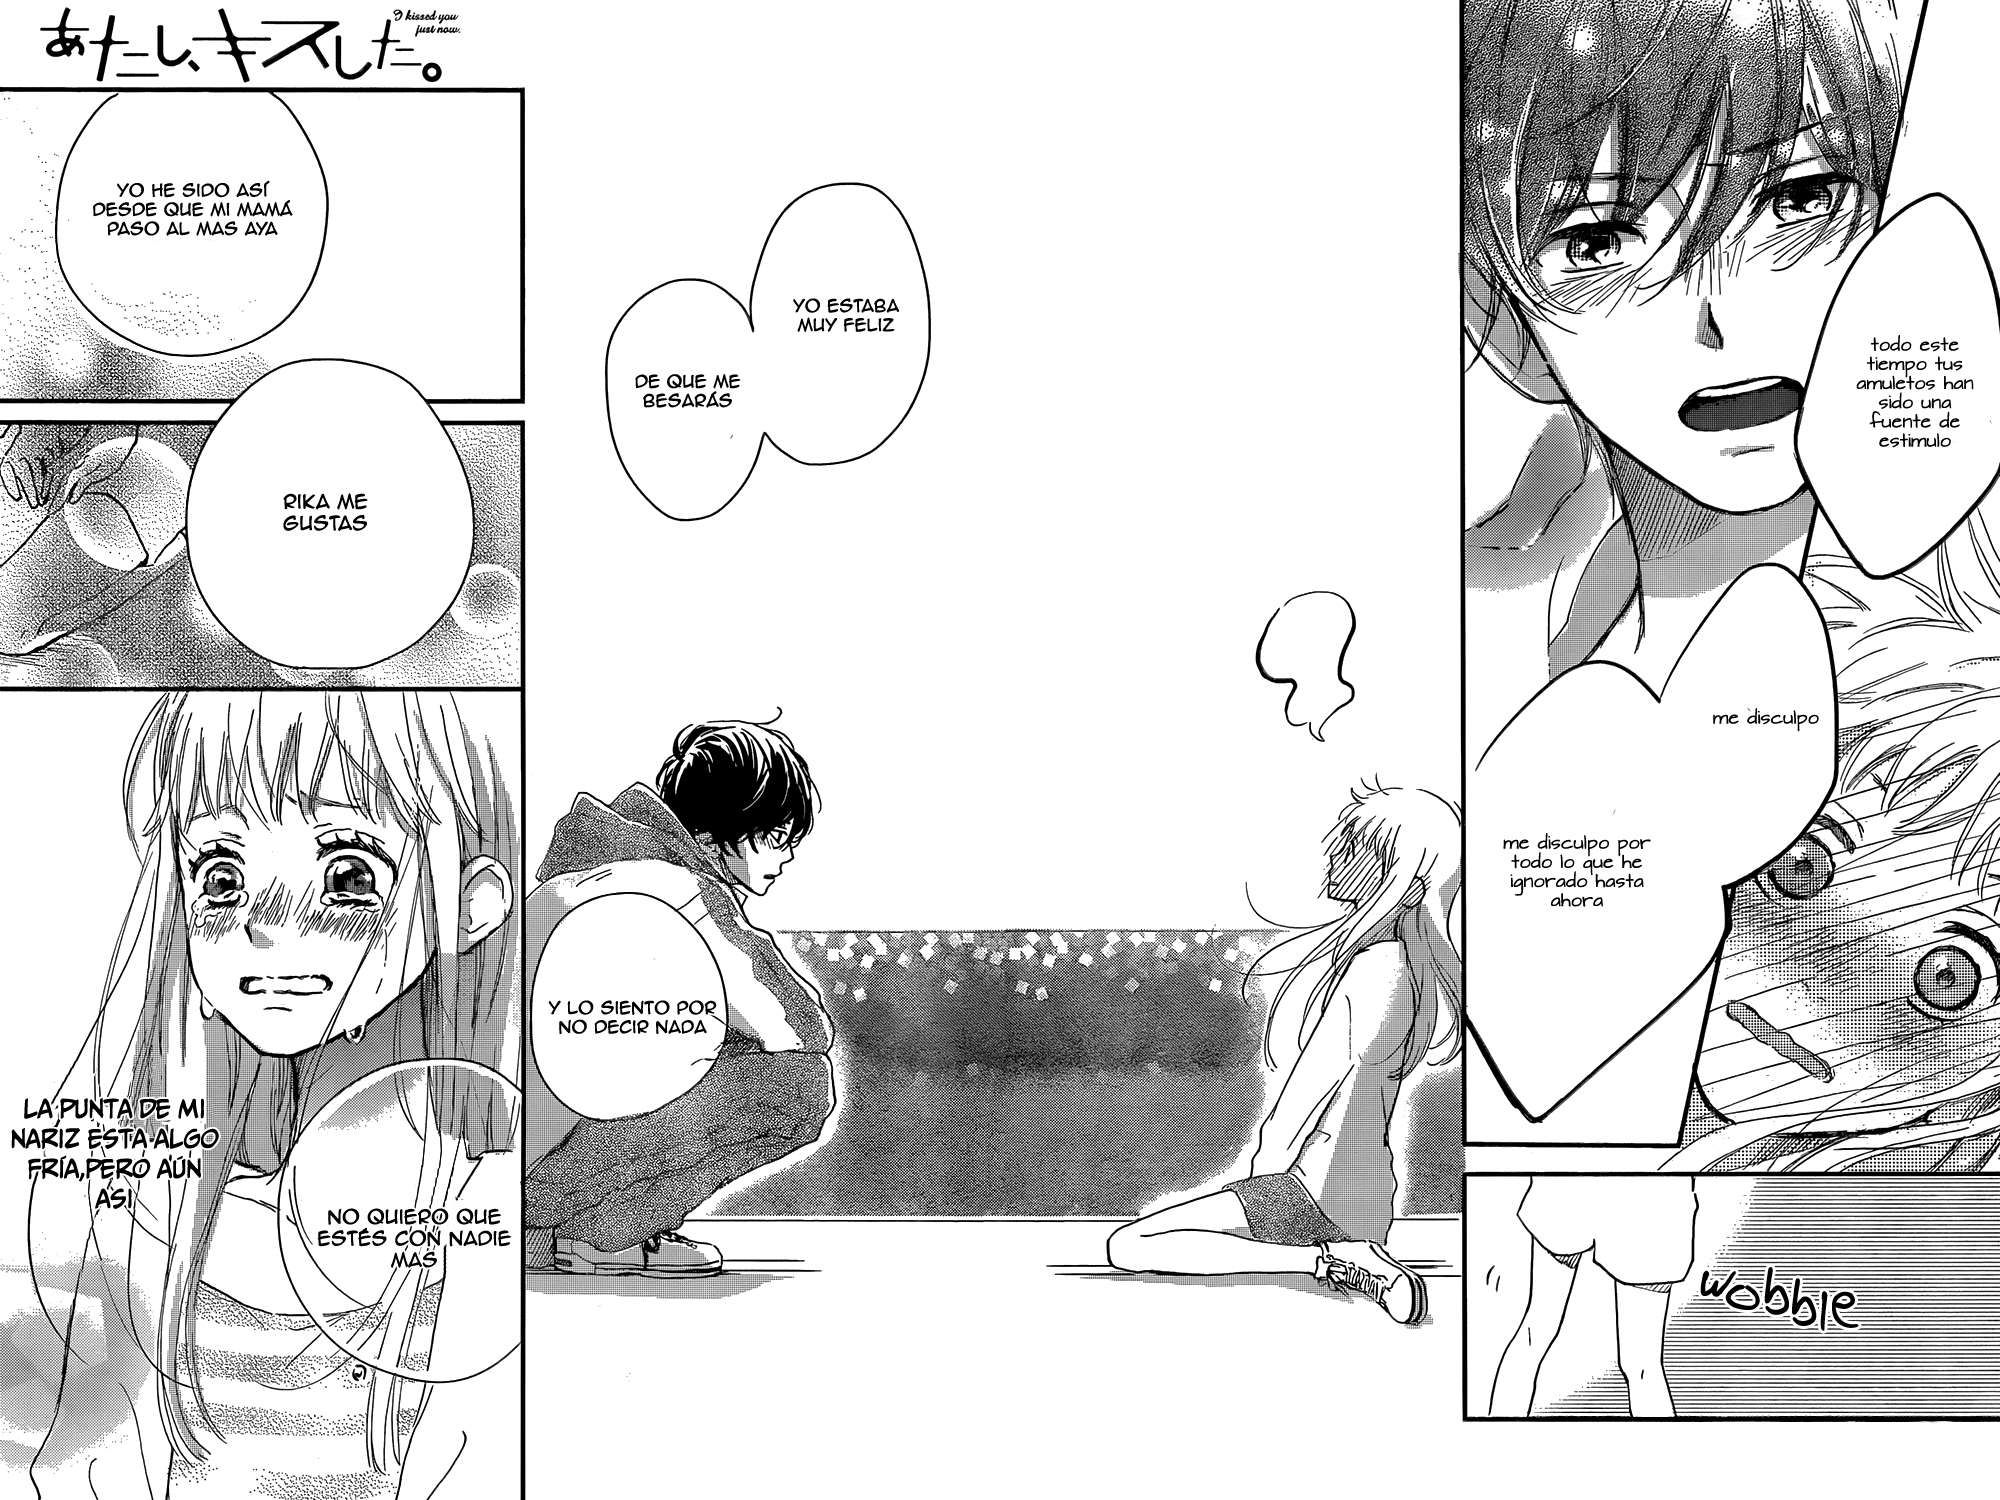 Atashi Kisushita Capitulo 1 Pagina 38 Leer Manga En Espanol